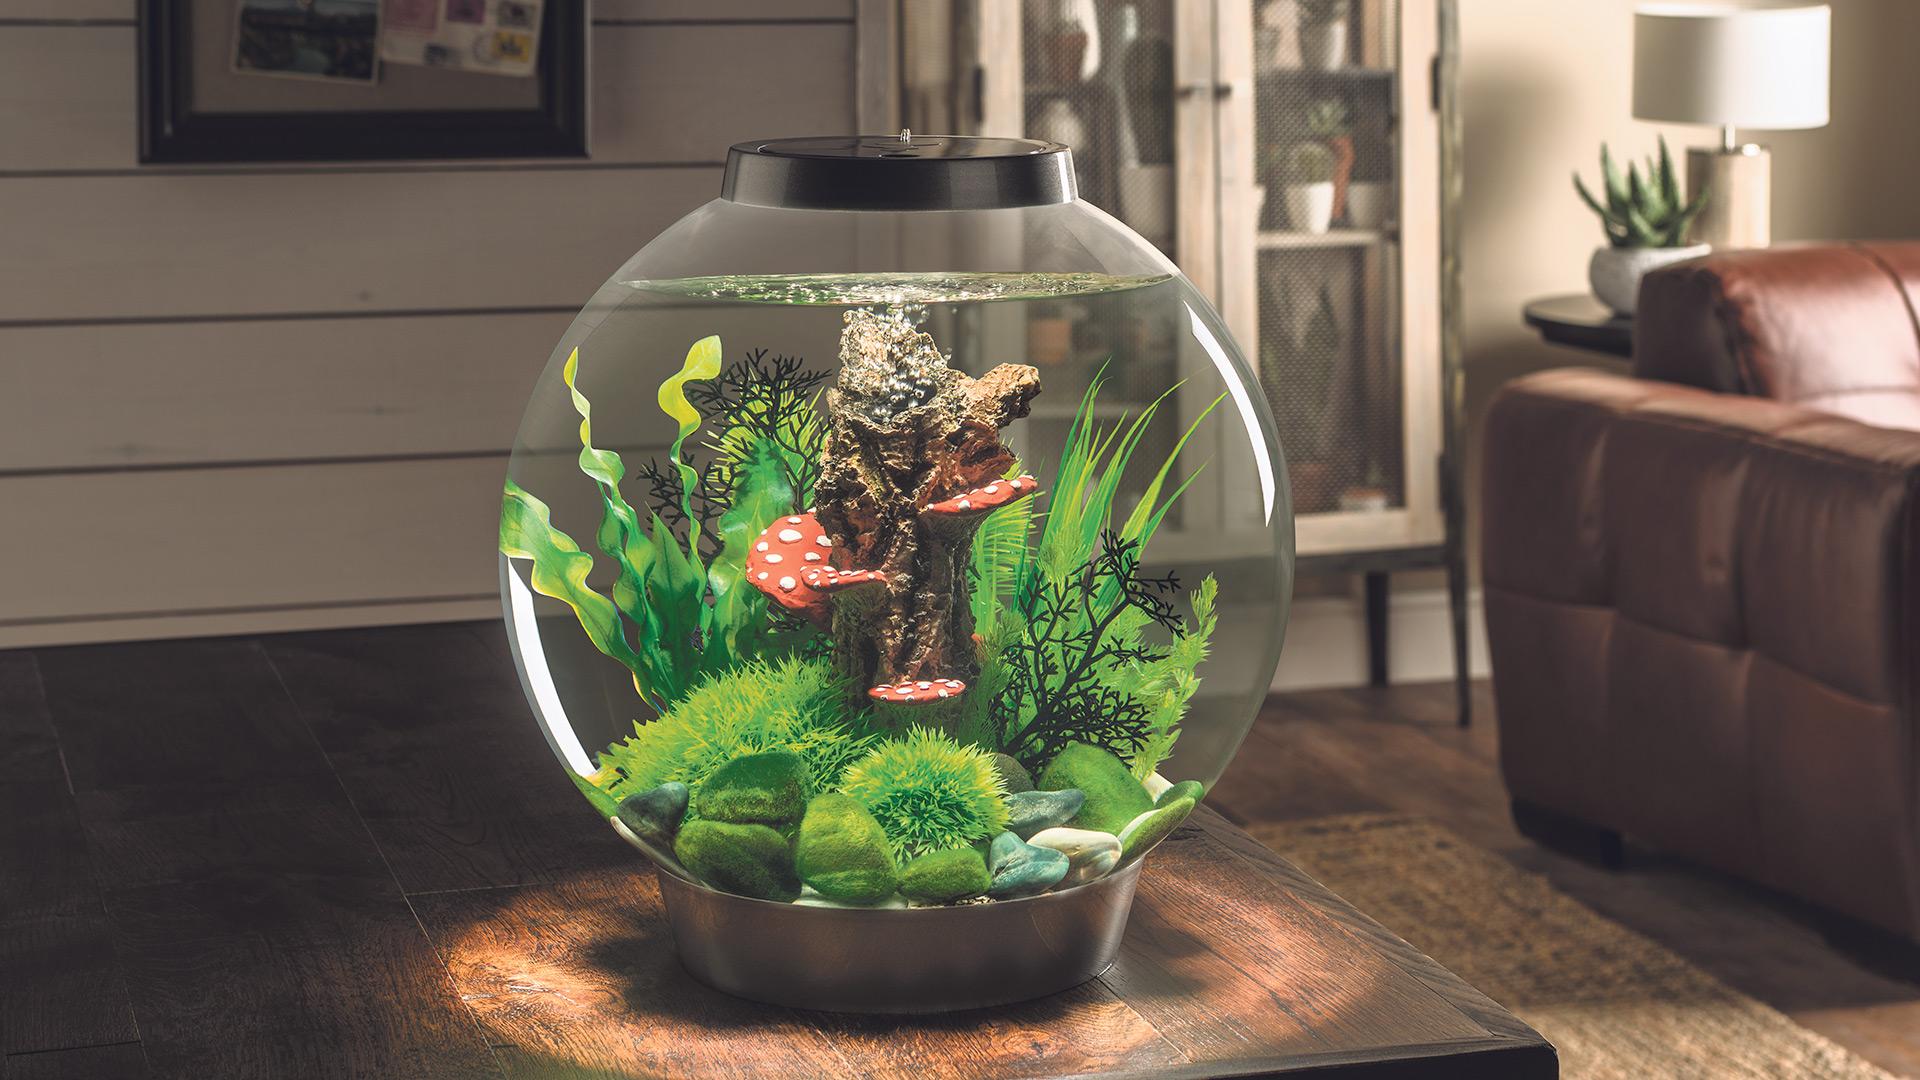 Win a biOrb CLASSIC 30 Aquarium Worth over £134!